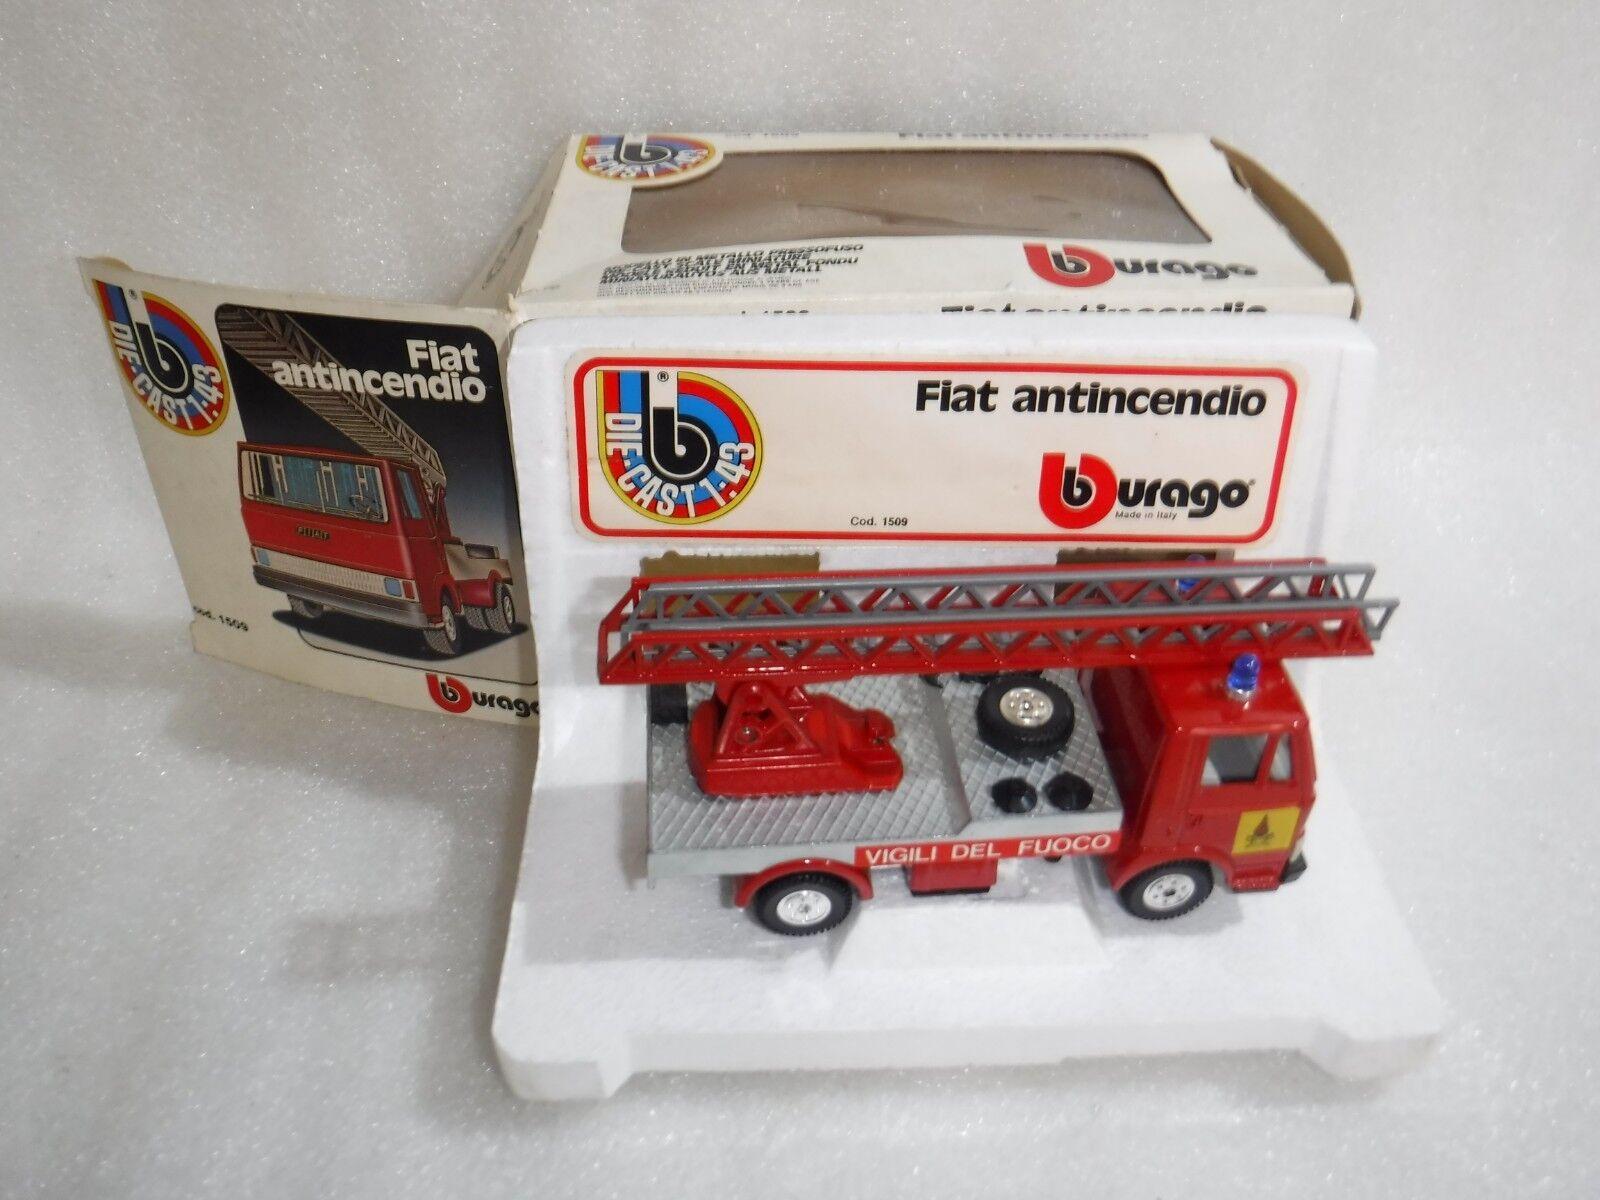 VINTAGE Bburago FIAT 50 NC antincendio vigili del fuoco in rosso, in scatola, raro